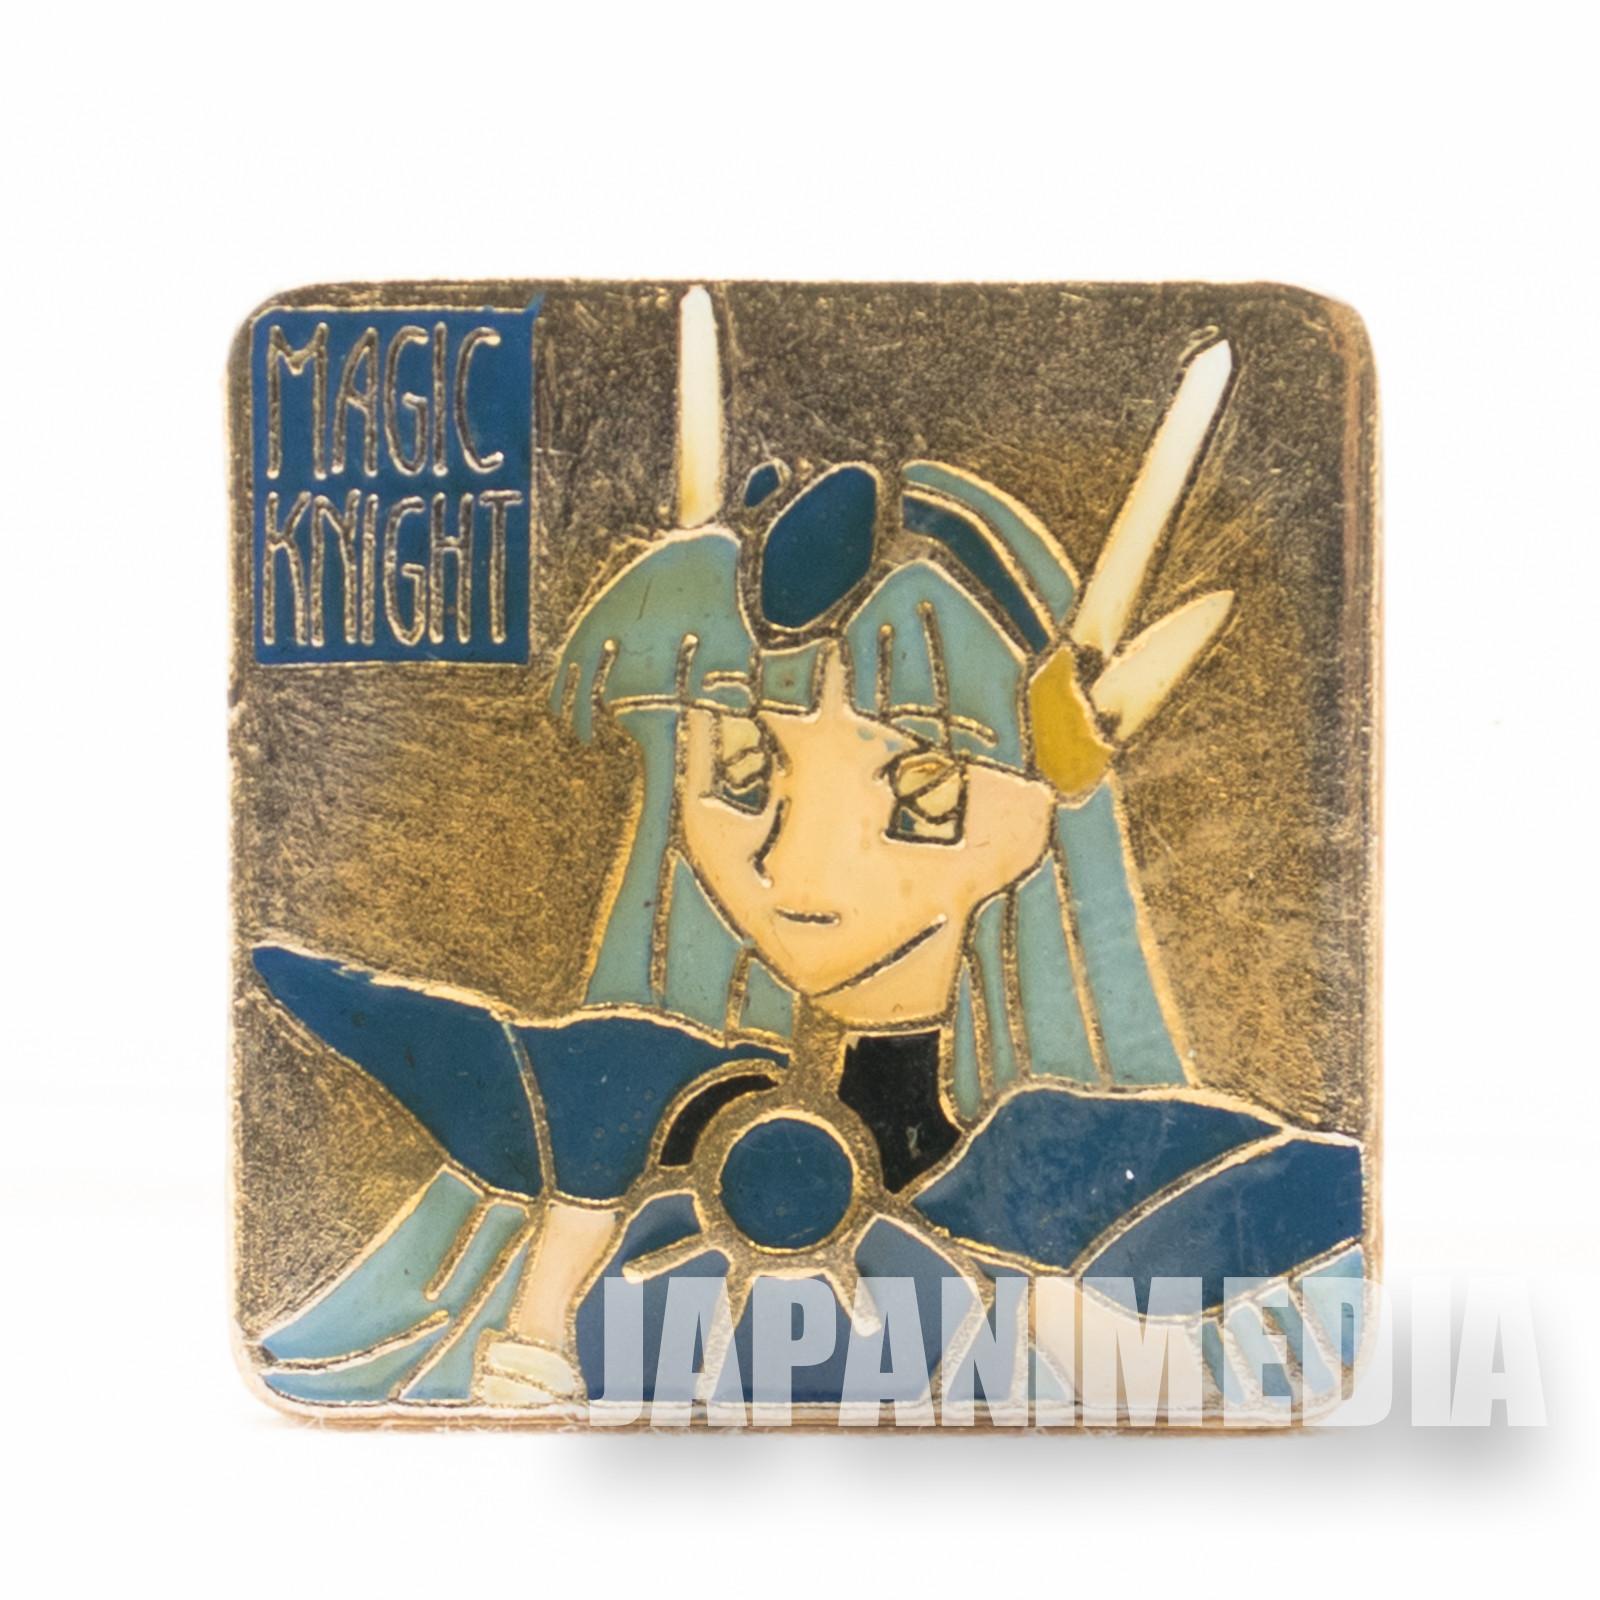 Magic Knight Rayearth Umi Ryuzaki Metal Pins Badge CLAMP JAPAN ANIME MANGA 2